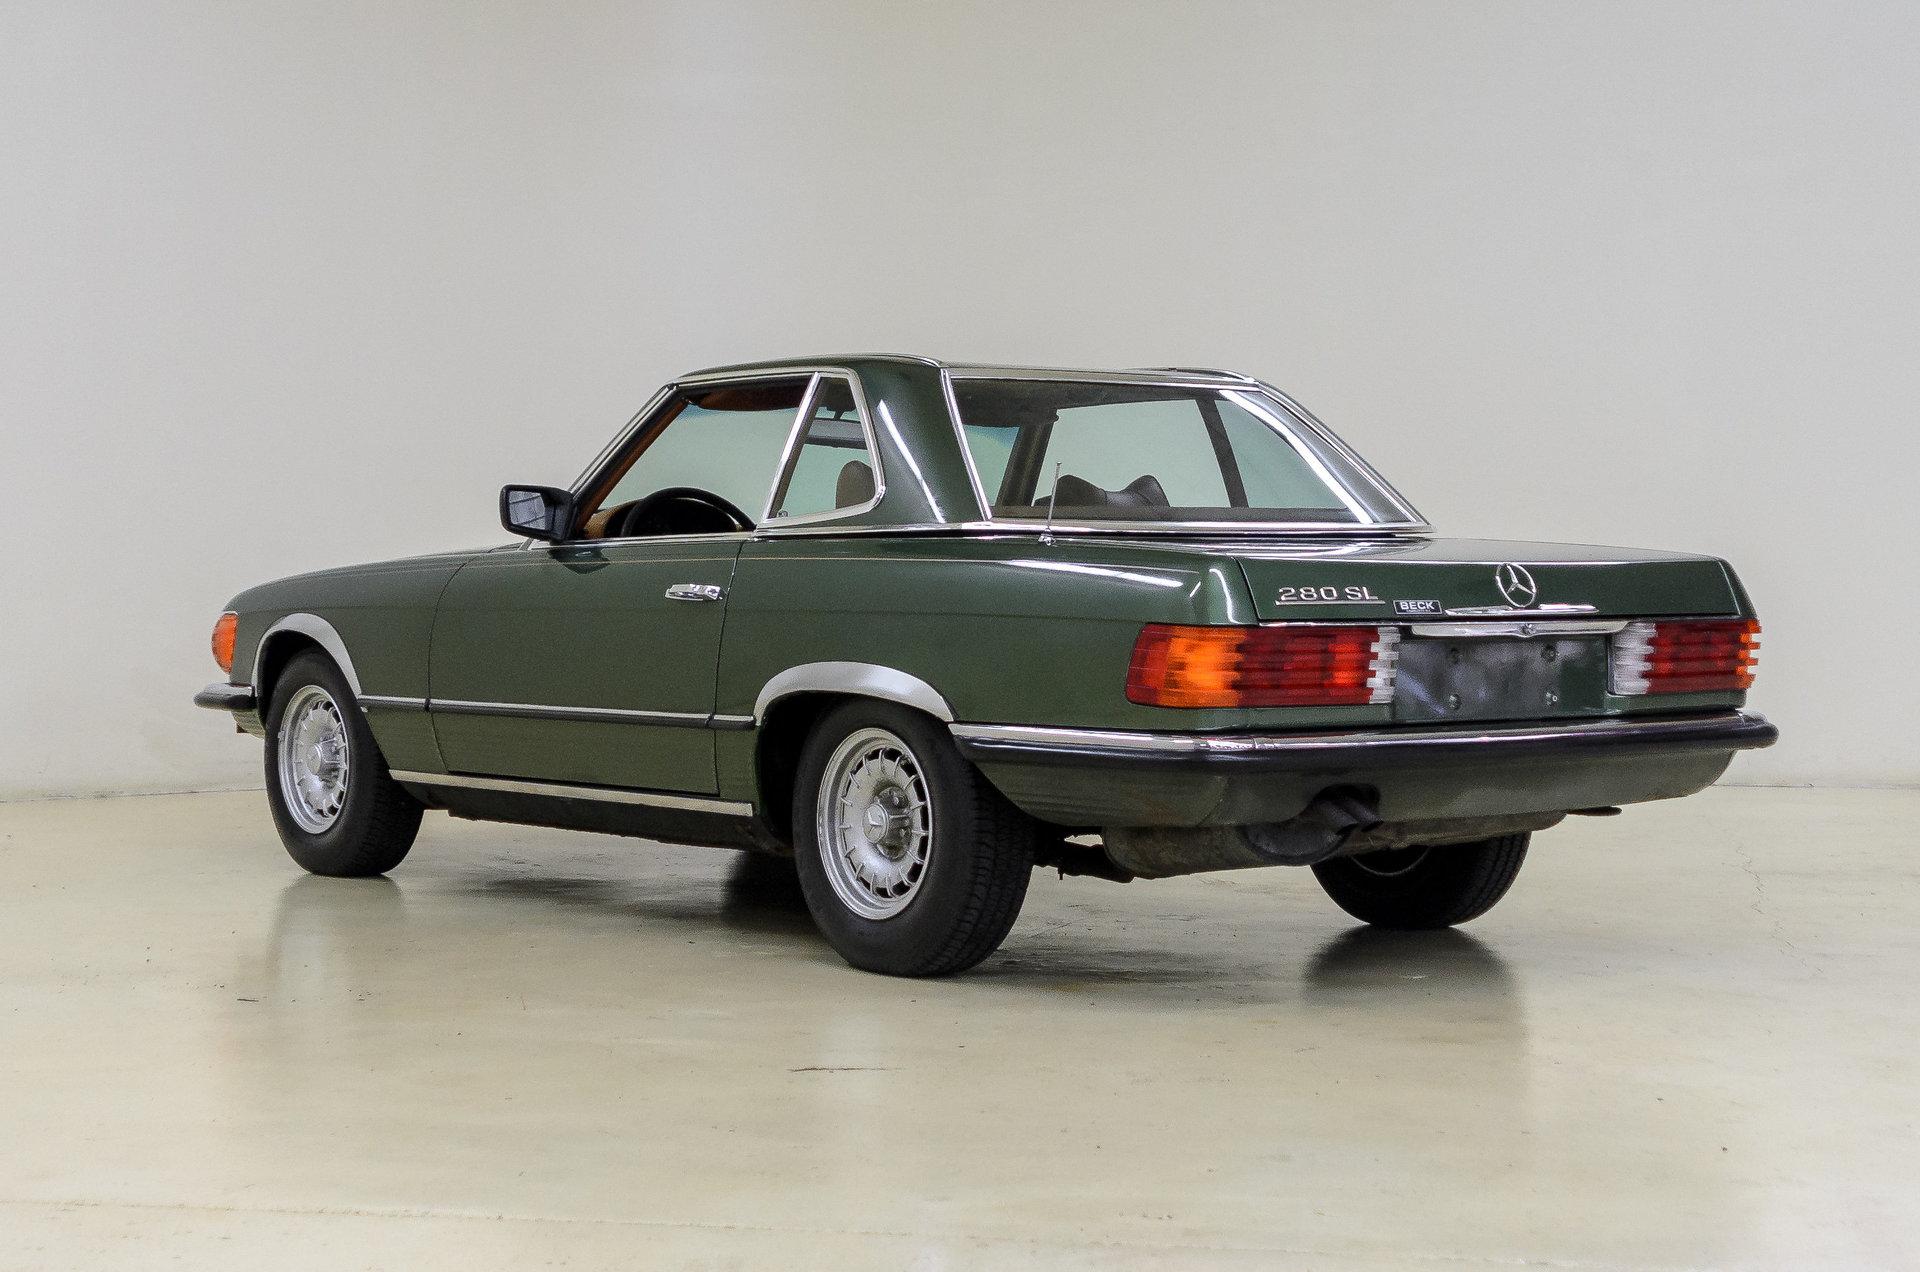 1976 Mercedes-Benz 280SL R107 for sale #92001 | MCG